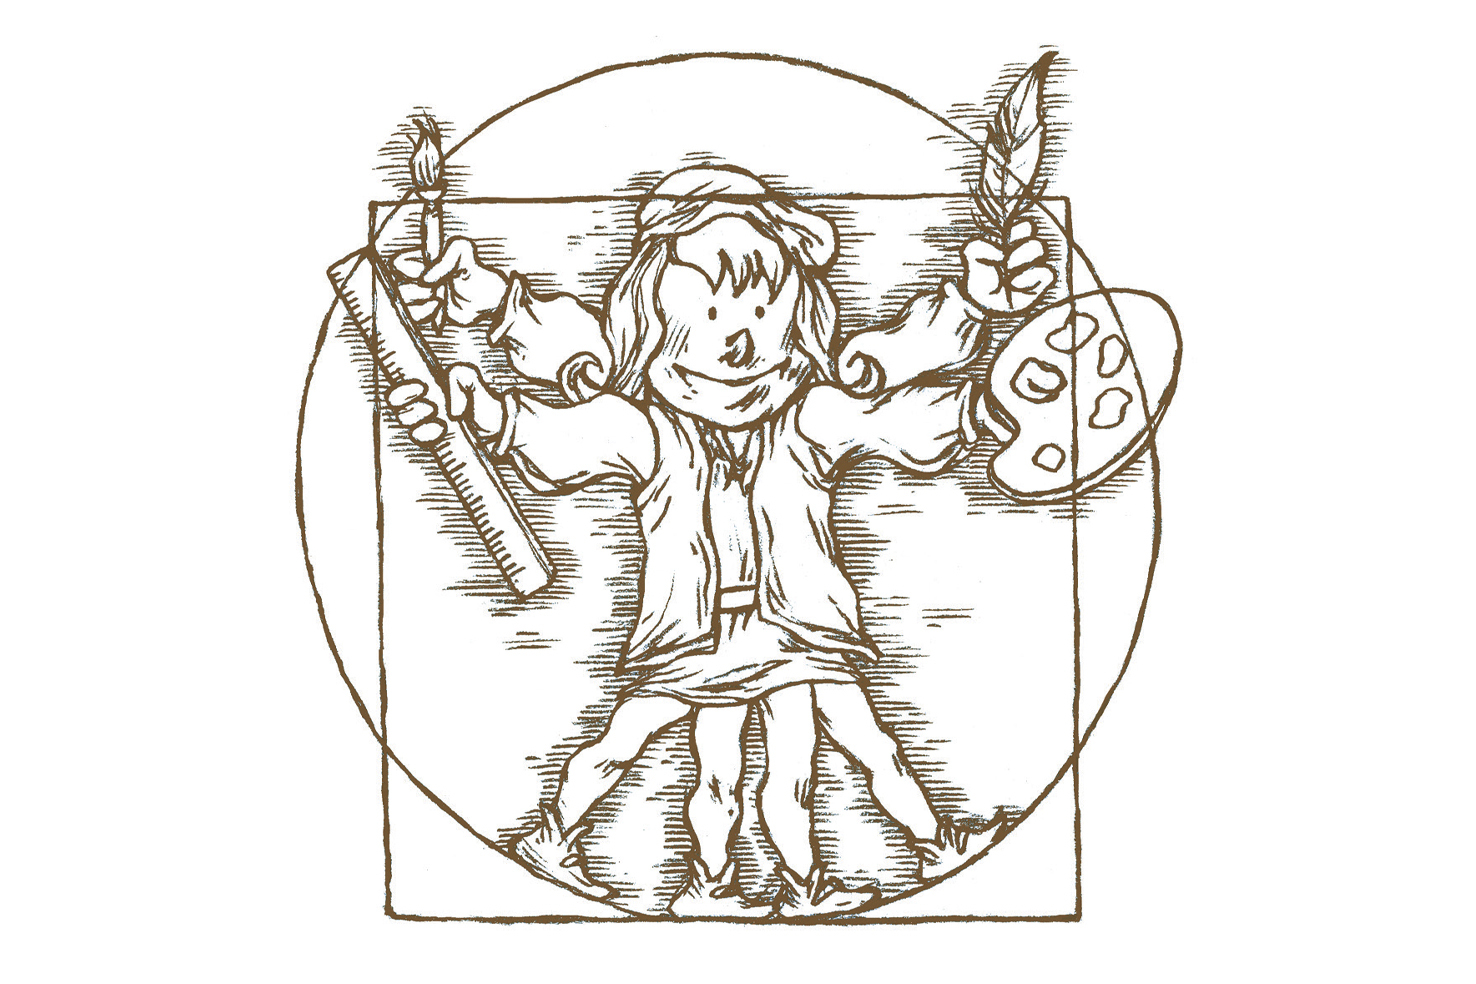 le petit leonard de vinci - les petits genies - boite a bulles logo